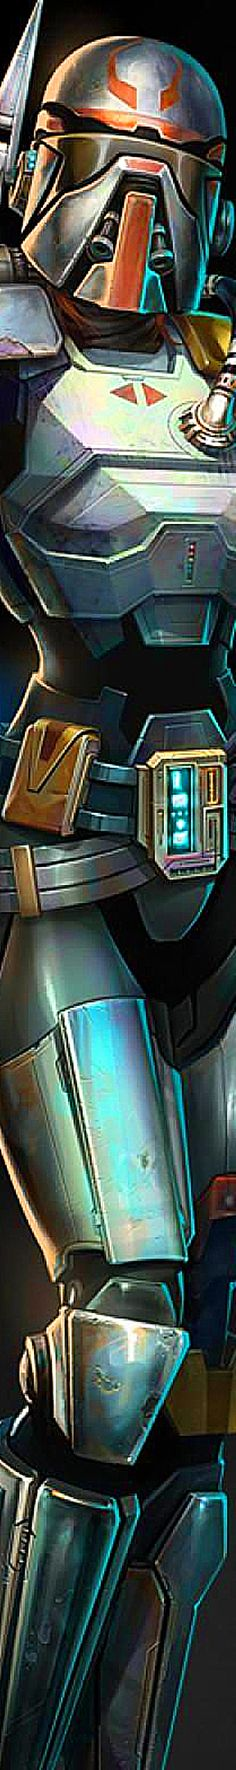 Star Wars - Bounty Hunter Old republic